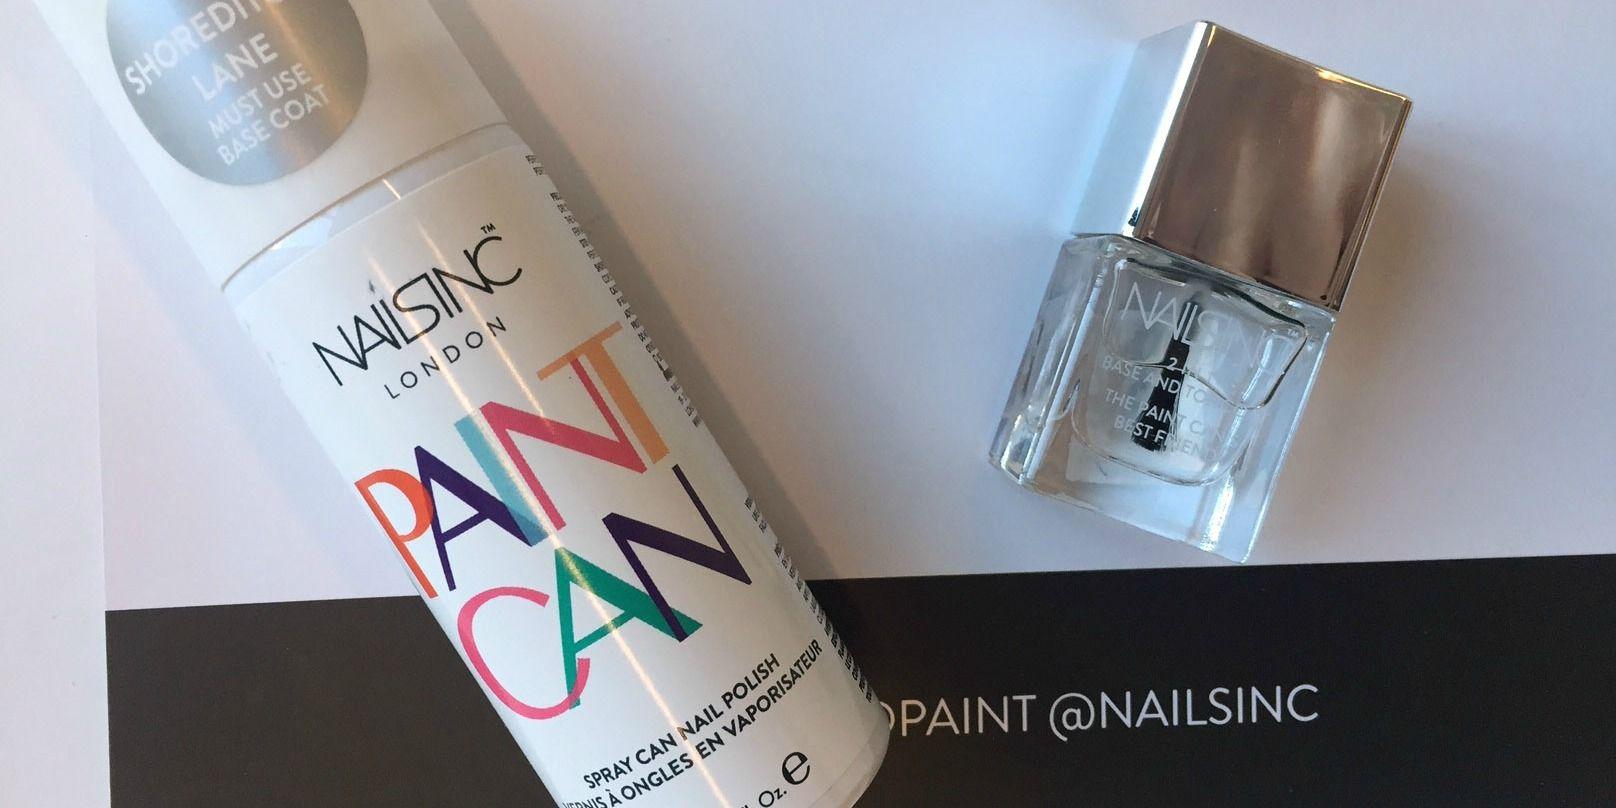 We Tried the New Spray-On Nail Polish by Nails Inc — Spray-On Nail ...